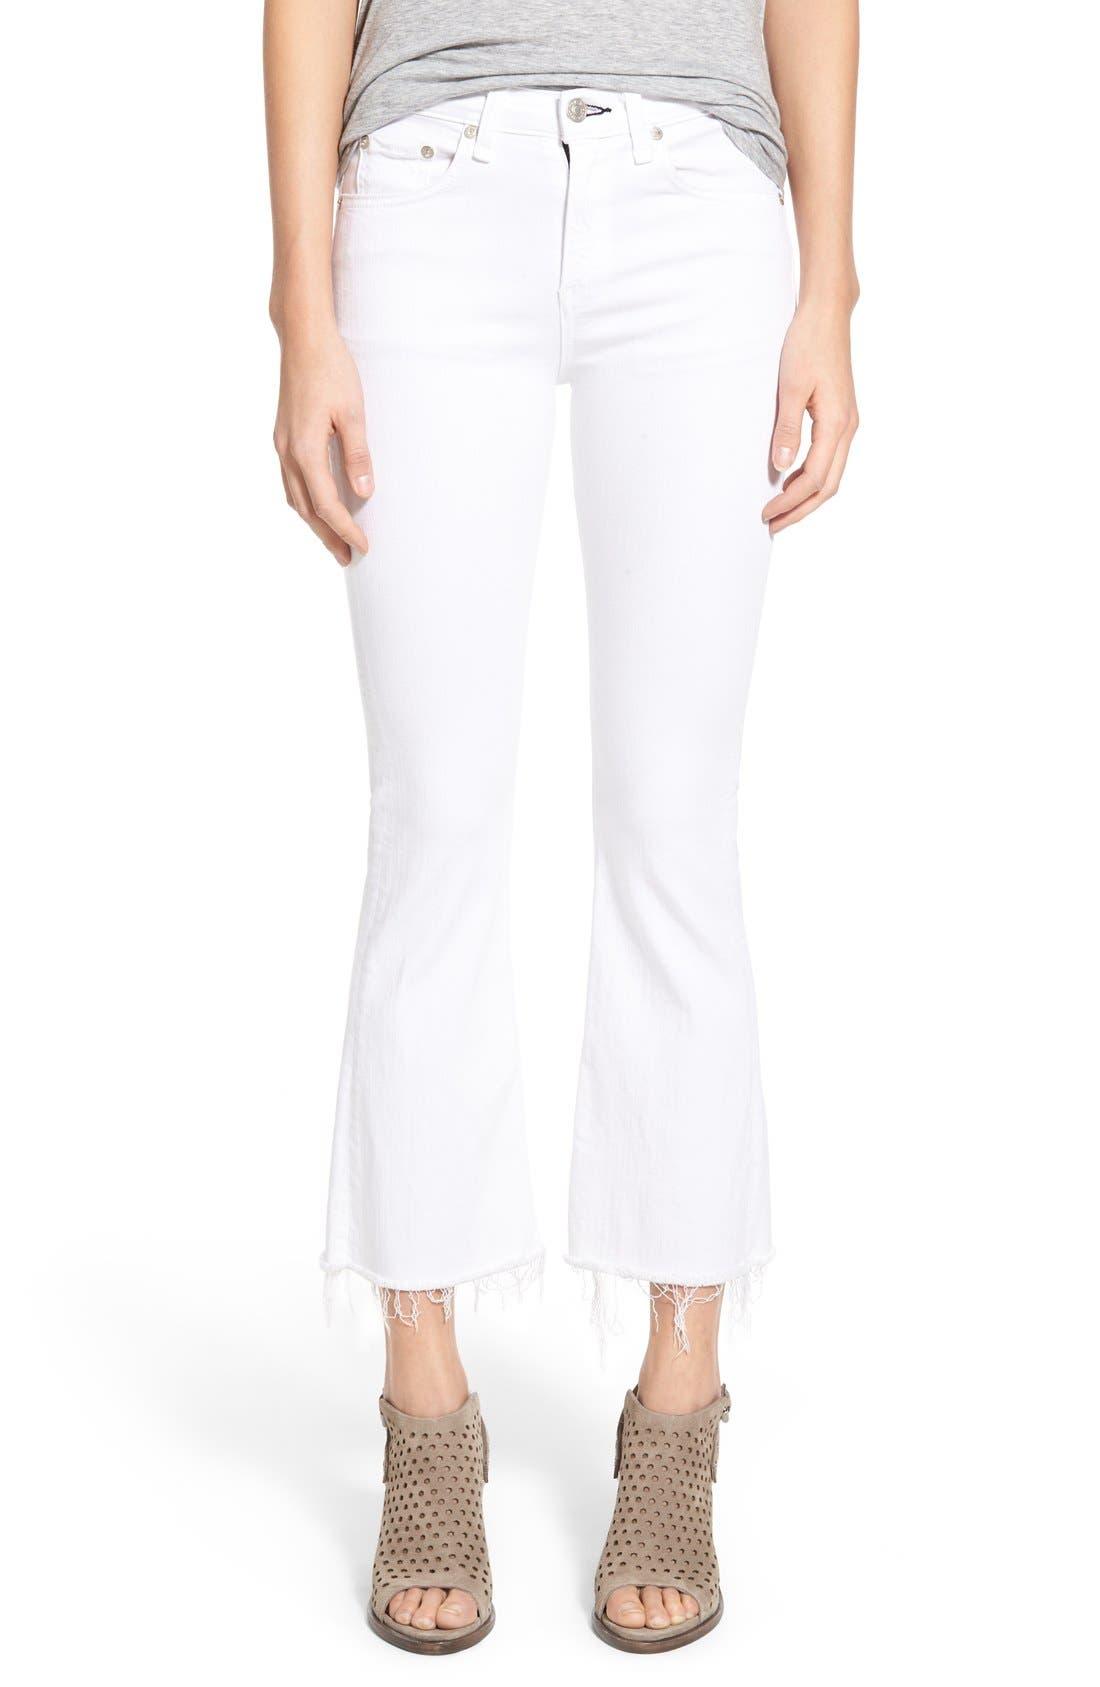 RAG & BONE High Rise Raw Hem Crop Flare Jeans, Main, color, BRIGHT WHITE